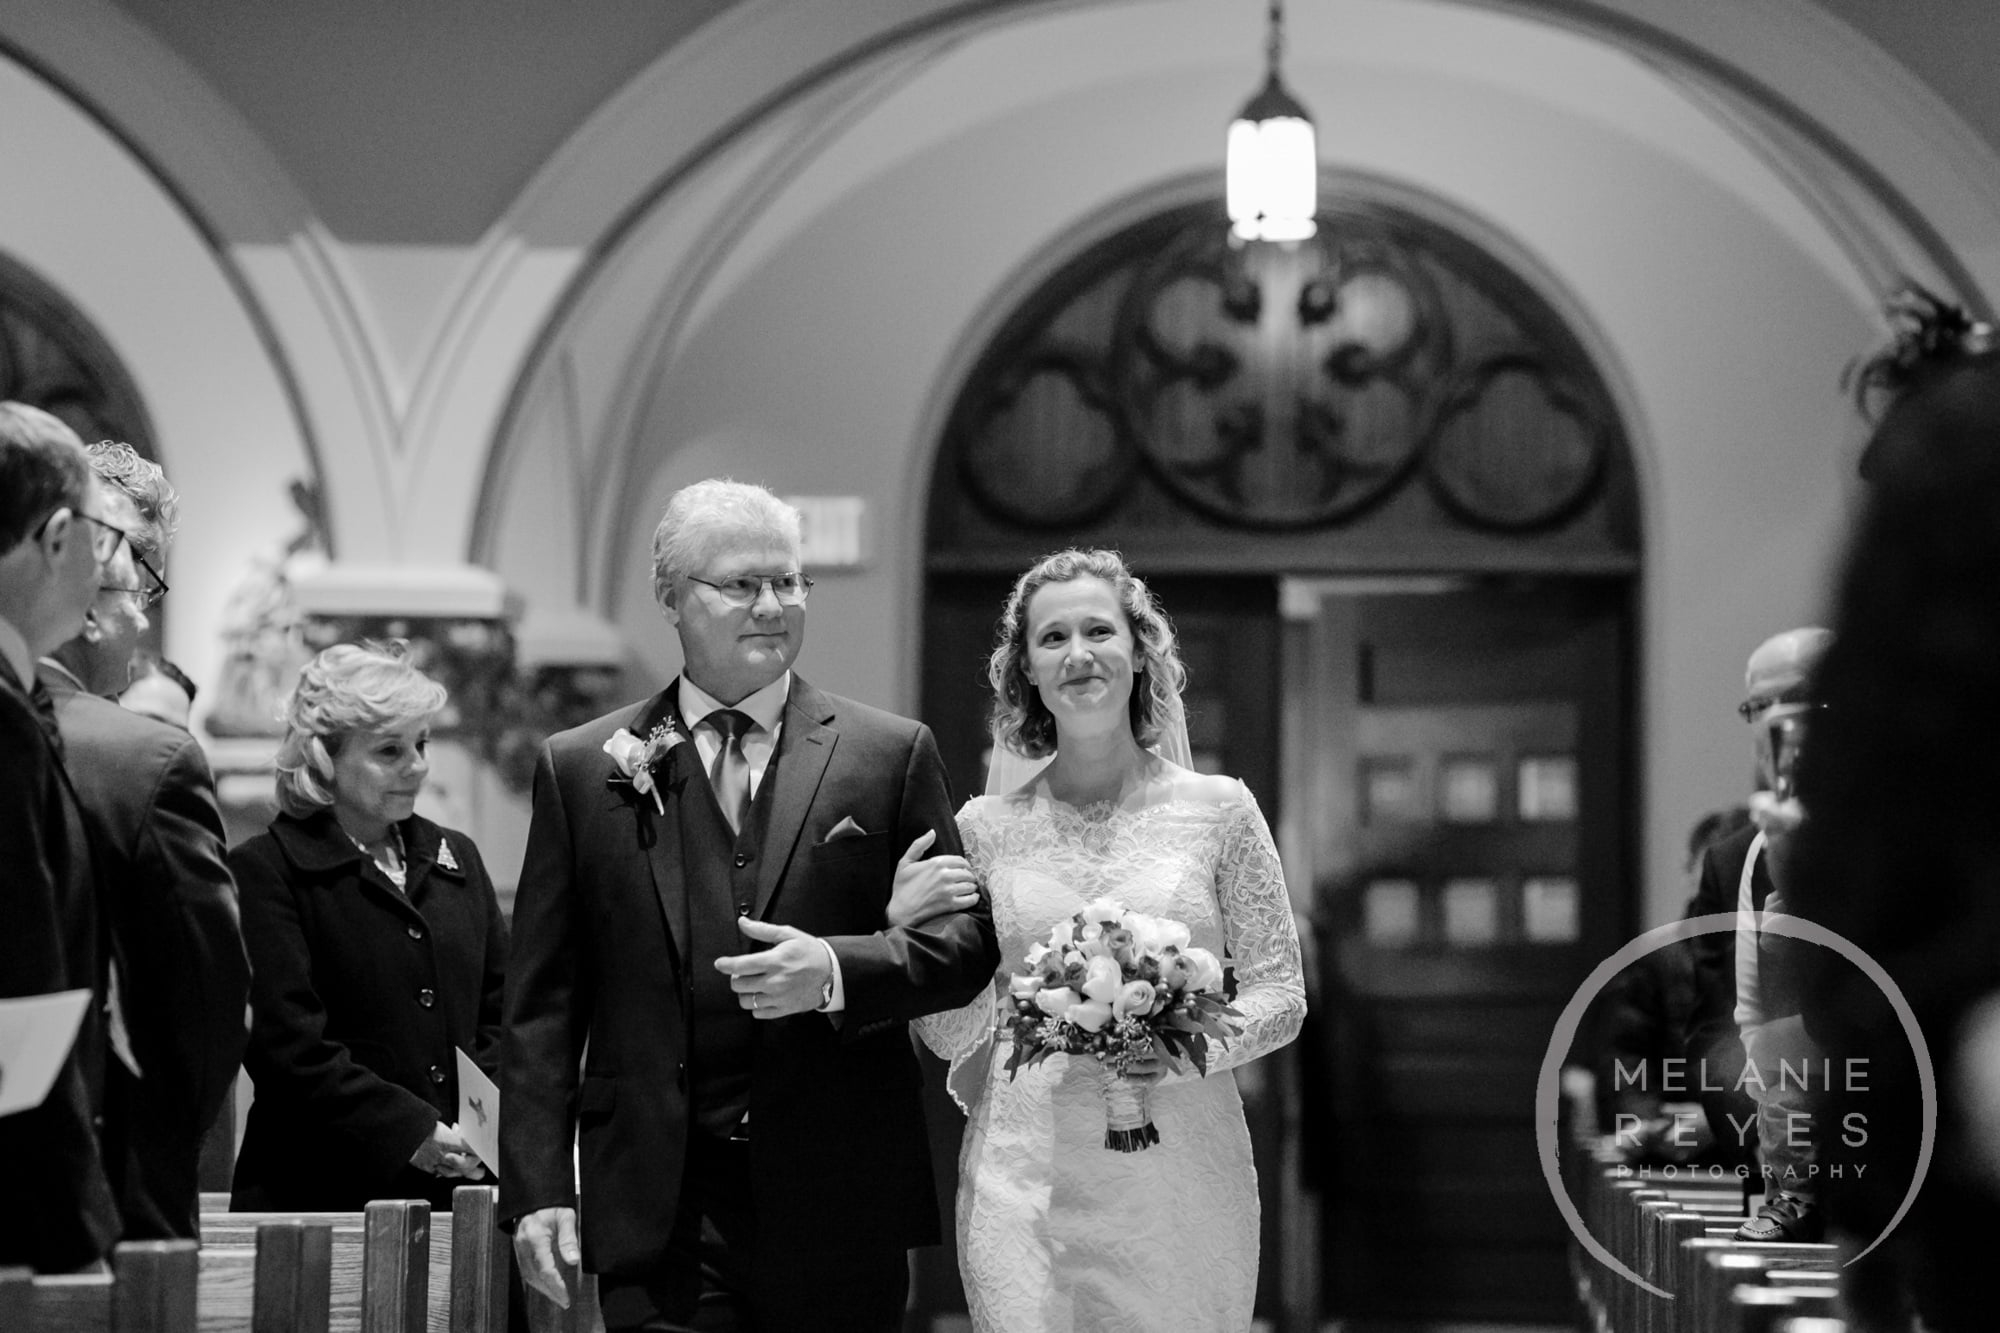 2015_ann_arbor_wedding_photographer_melaniereyes_025.JPG